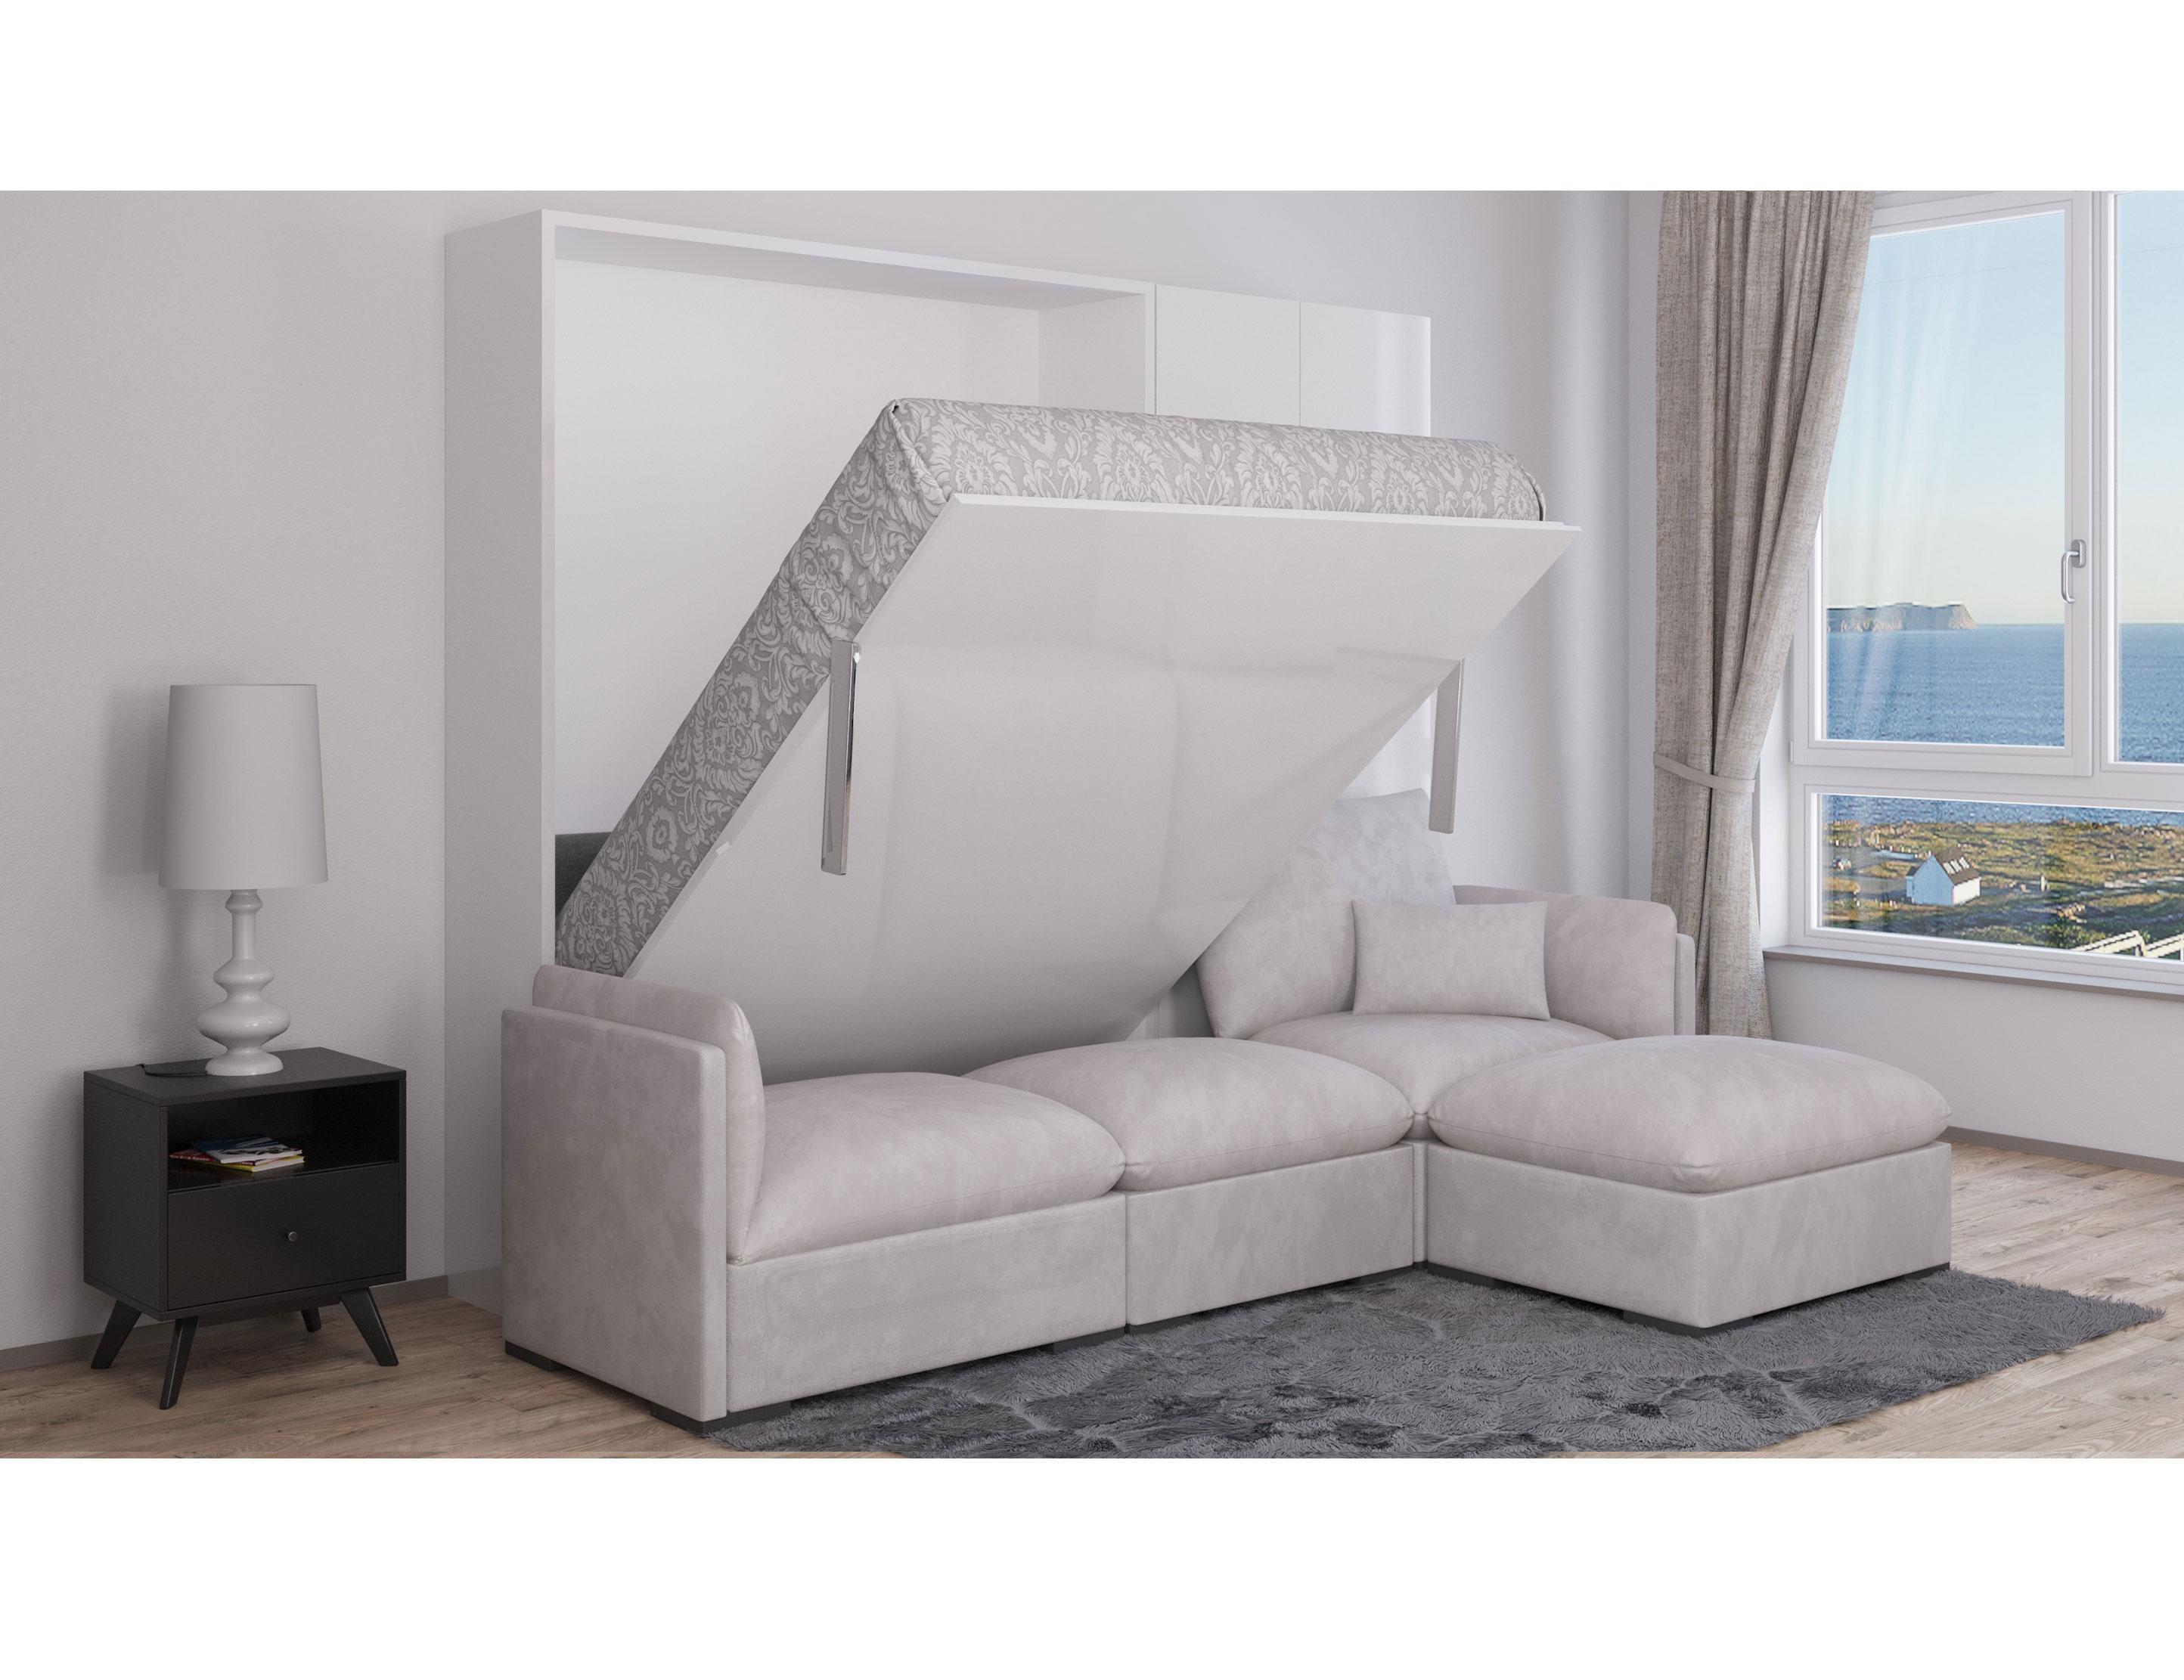 murphysofa adagio queen luxury sectional sofa wall bed